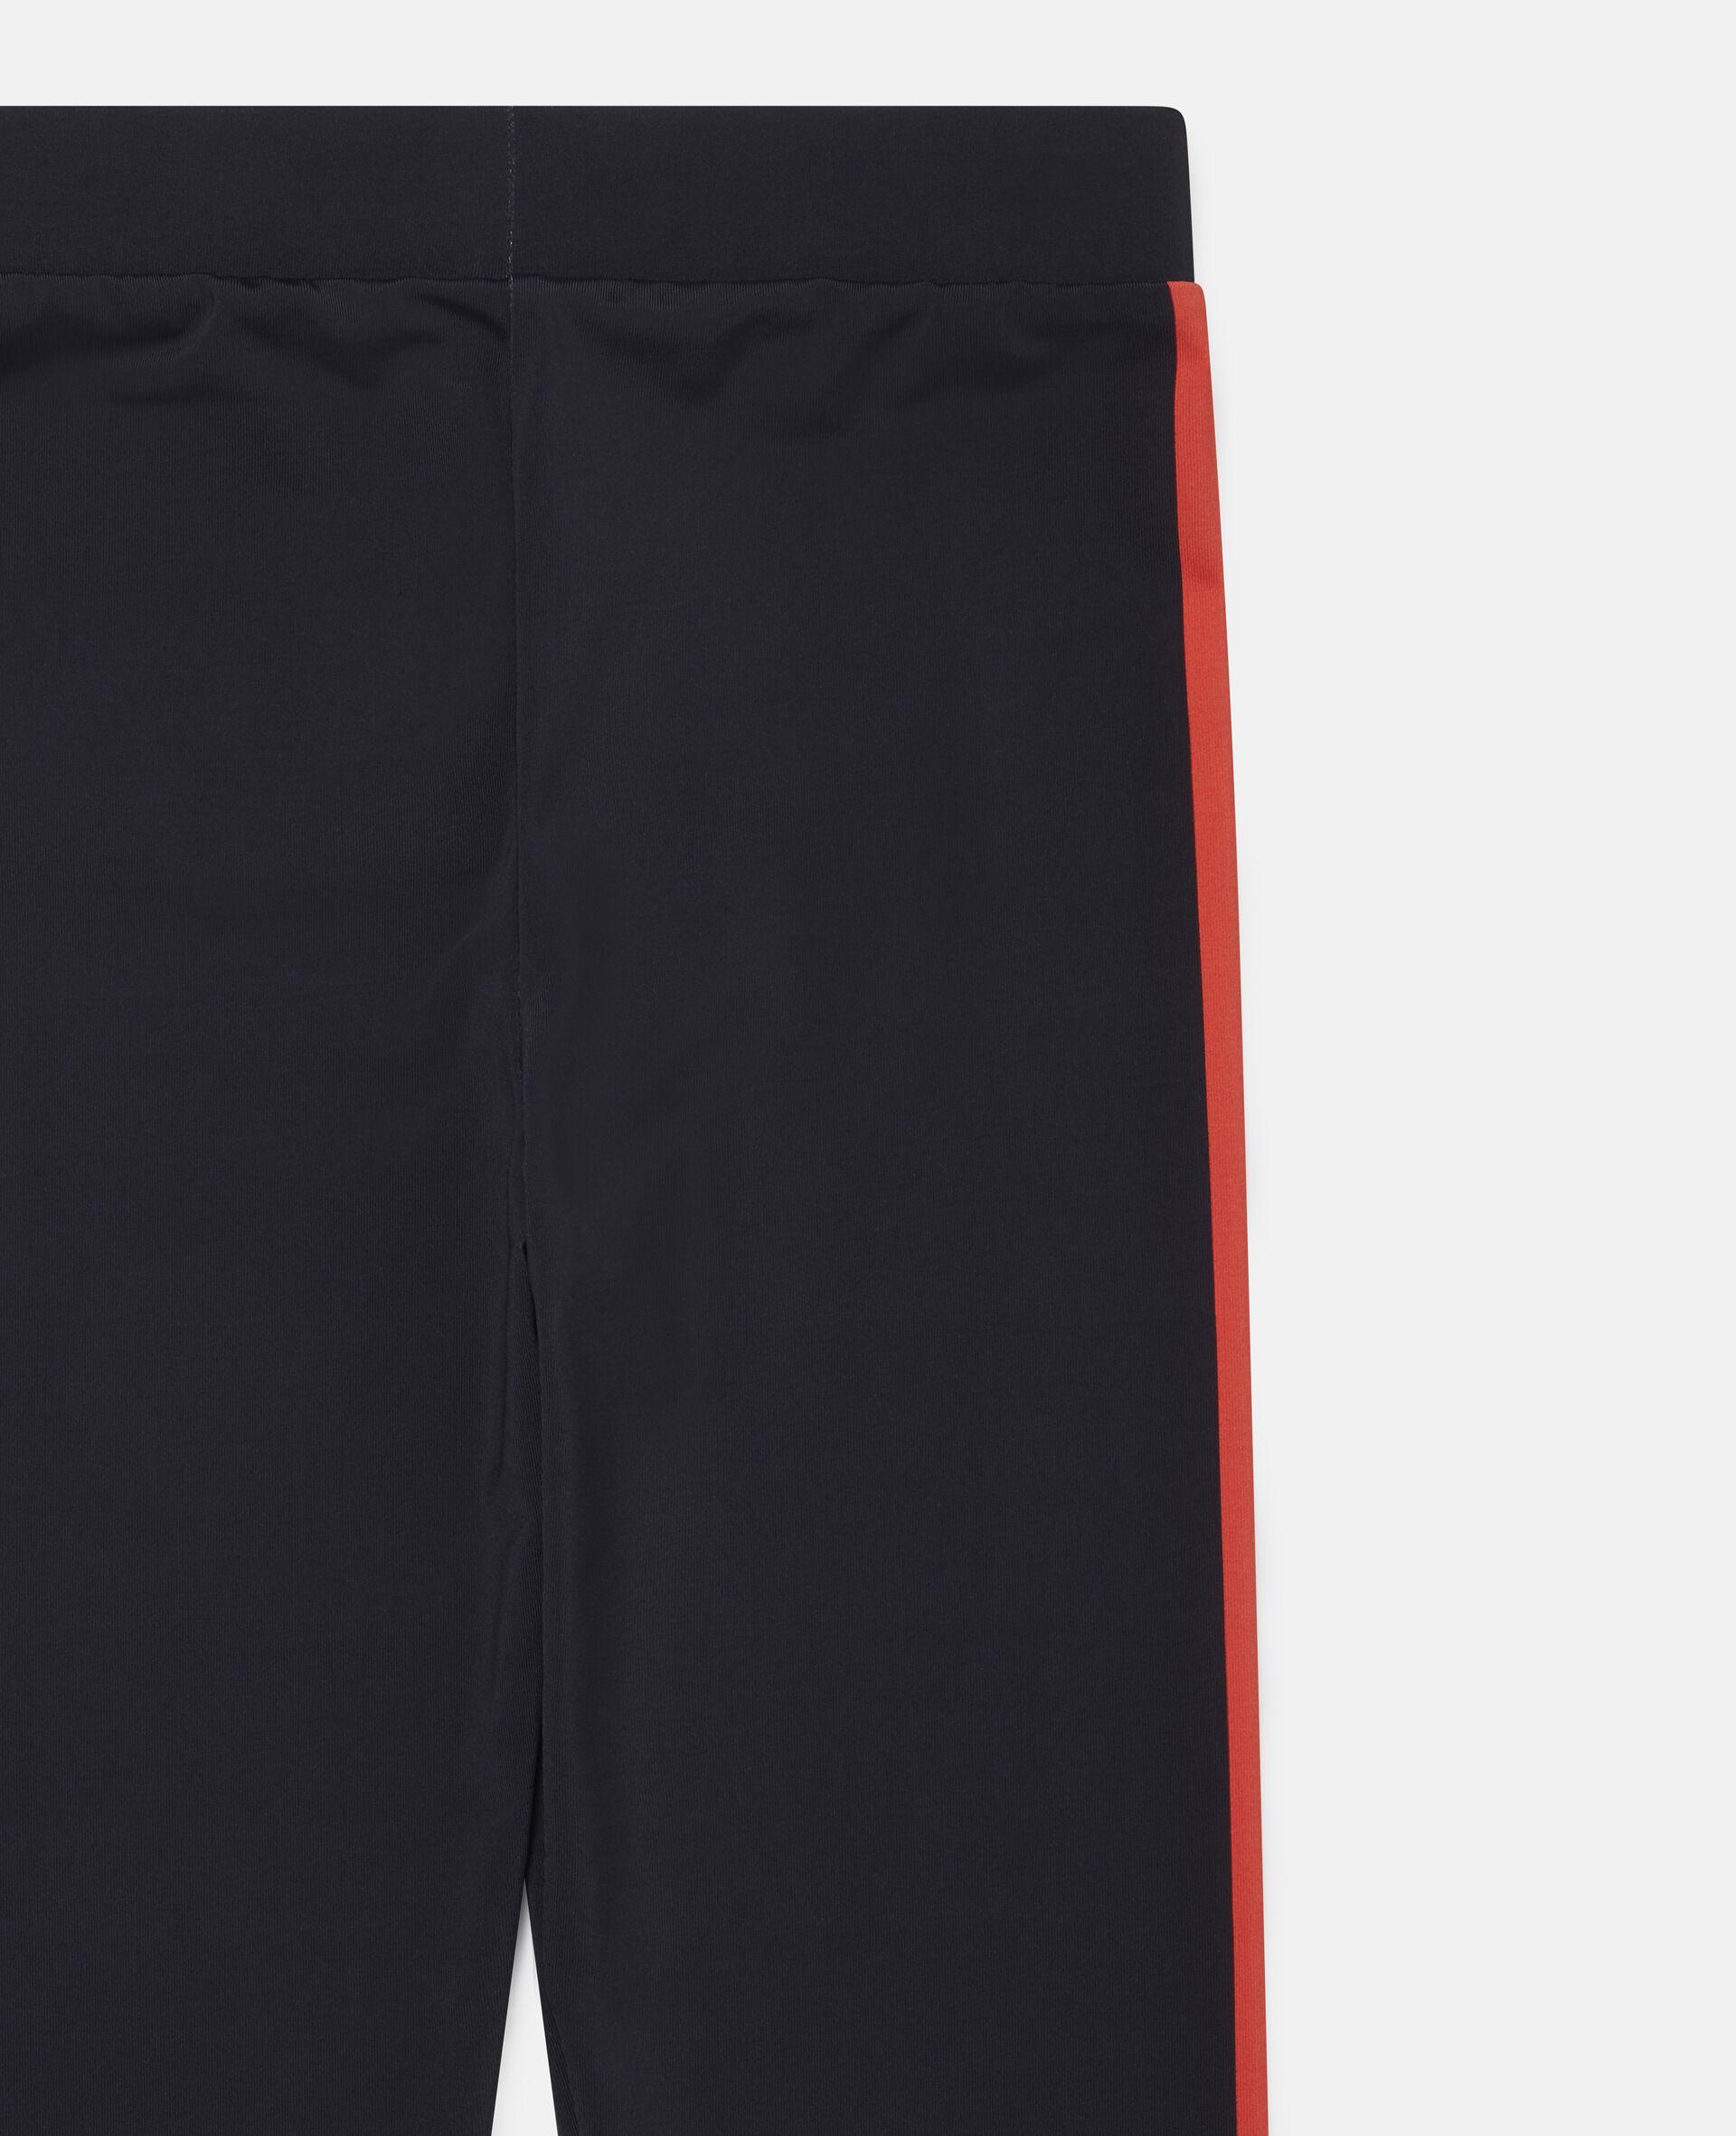 Stella Pencils Leggings -Black-large image number 2